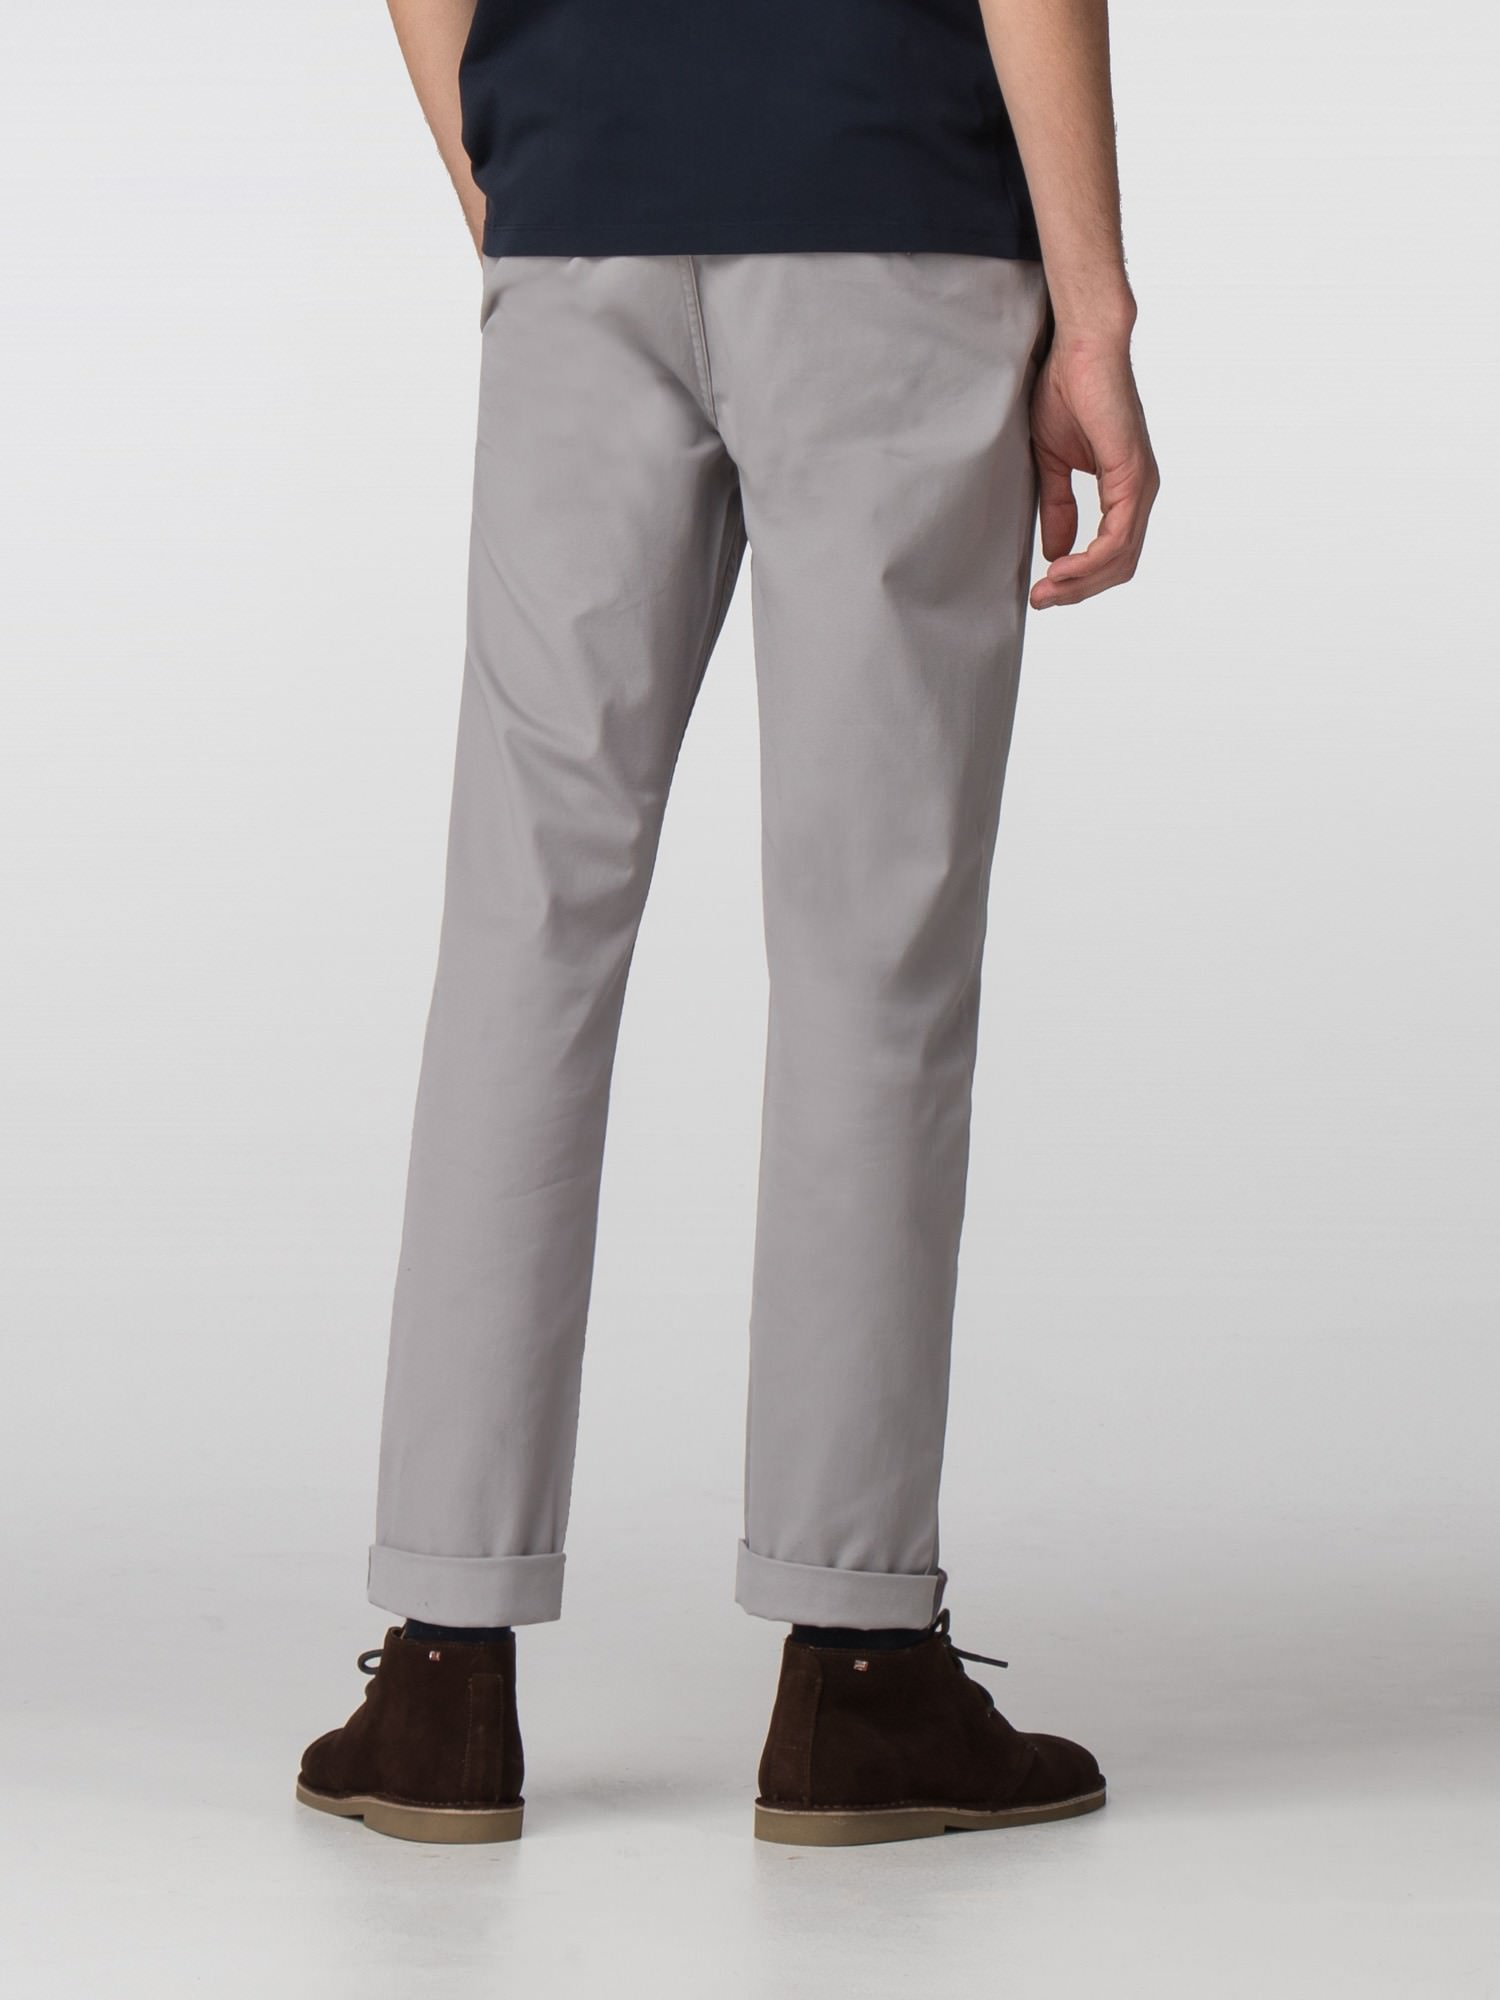 Ash Grey Slim Stretch Chino